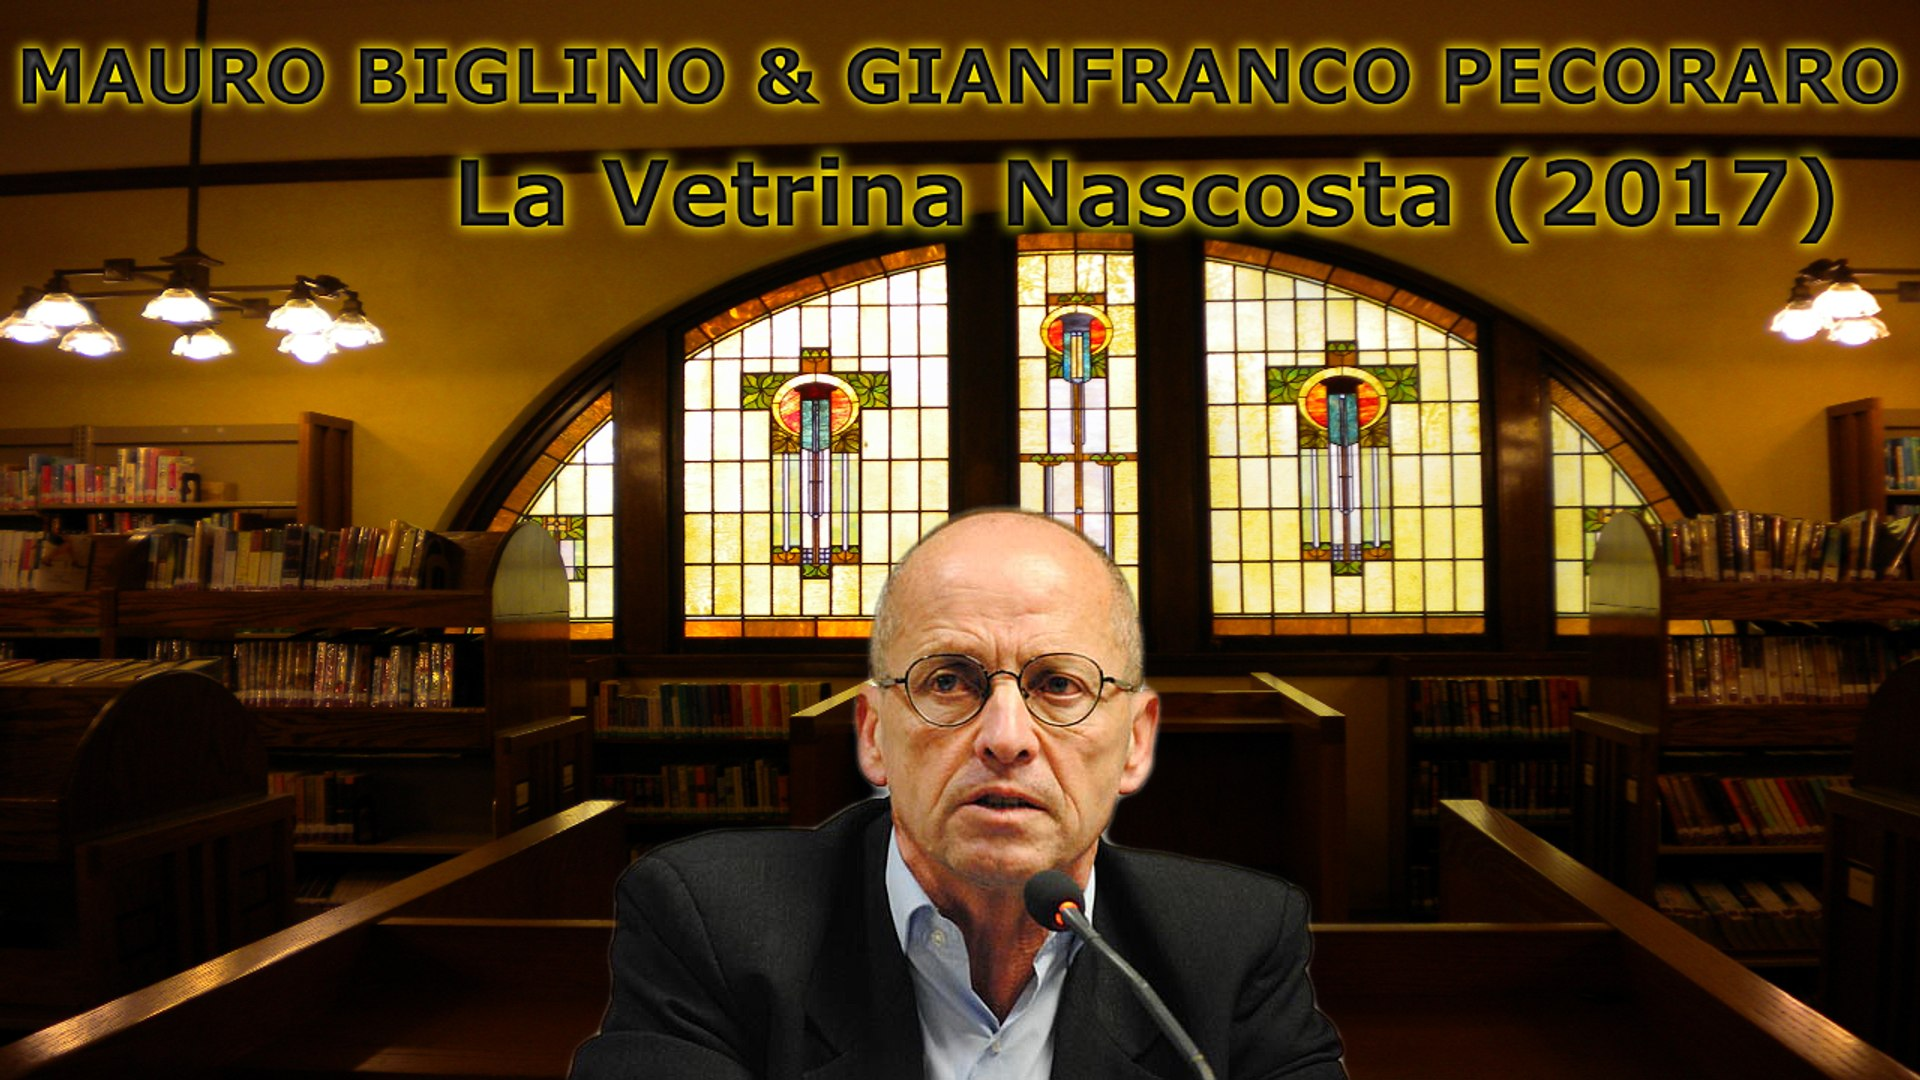 MAURO BIGLINO & GIANFRANCO PECORARO - La Vetrina Nascosta (2017)